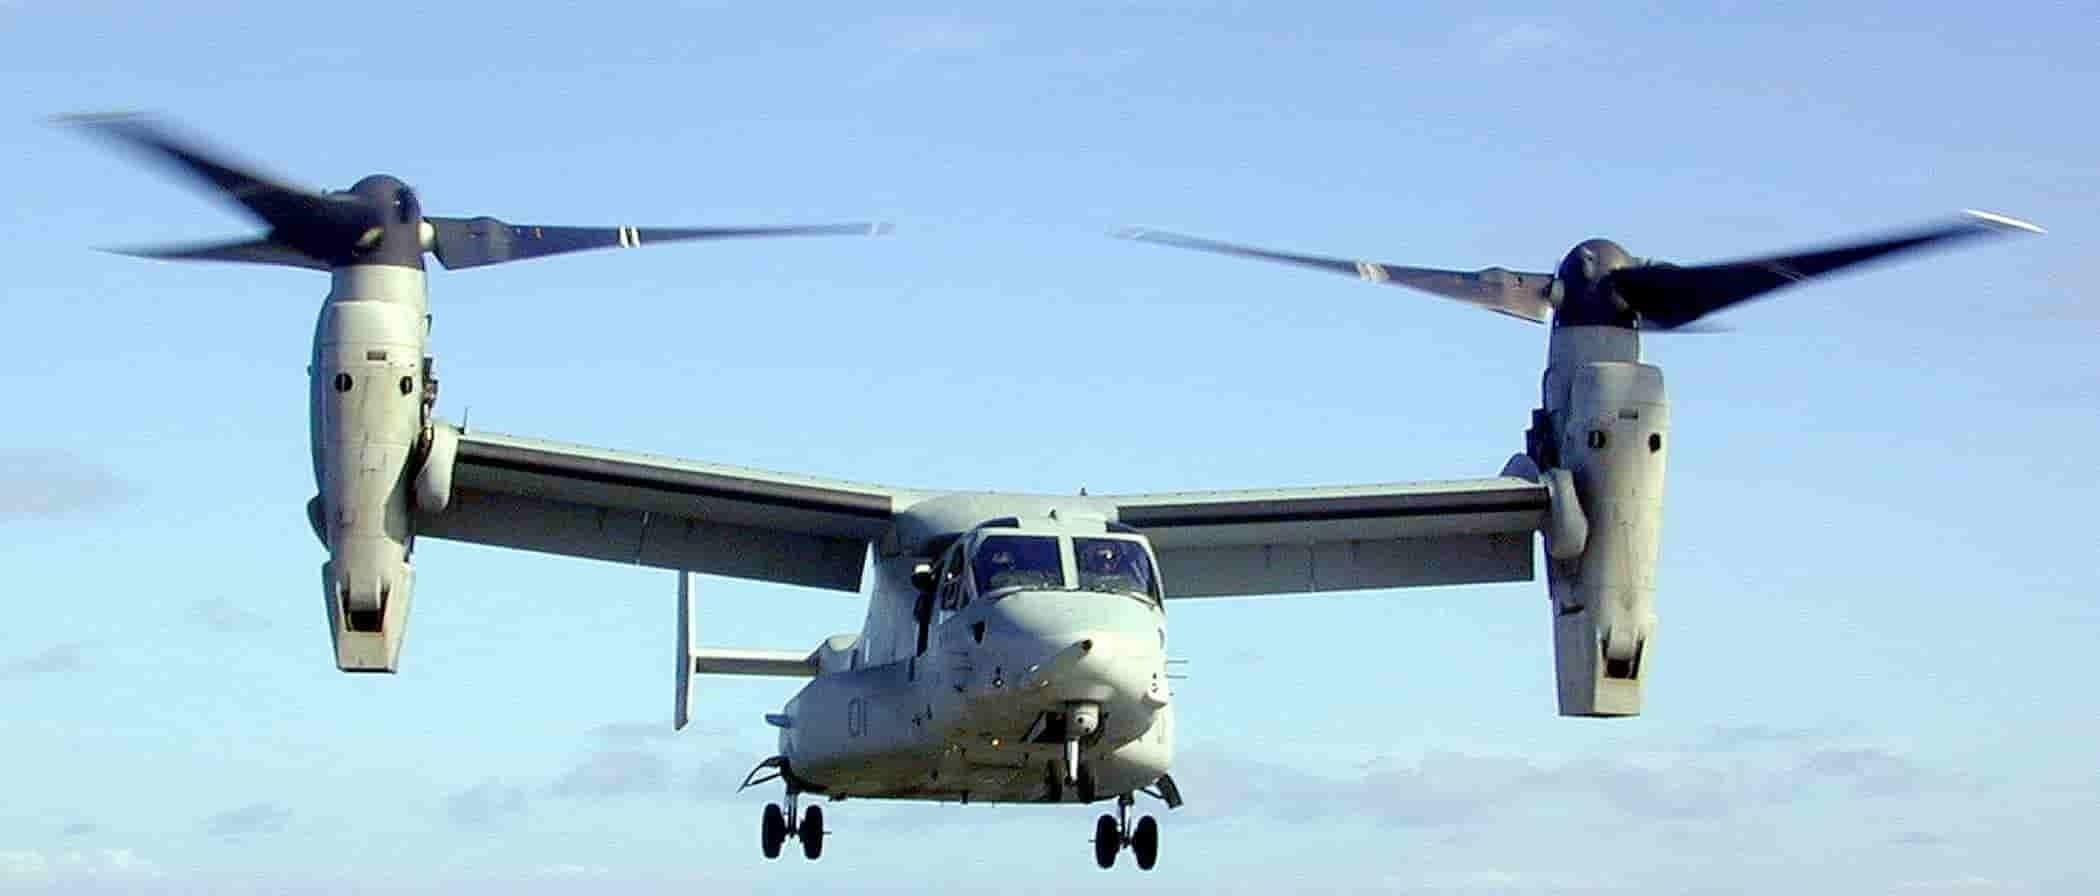 RC VTOL(vertical take off and landing)